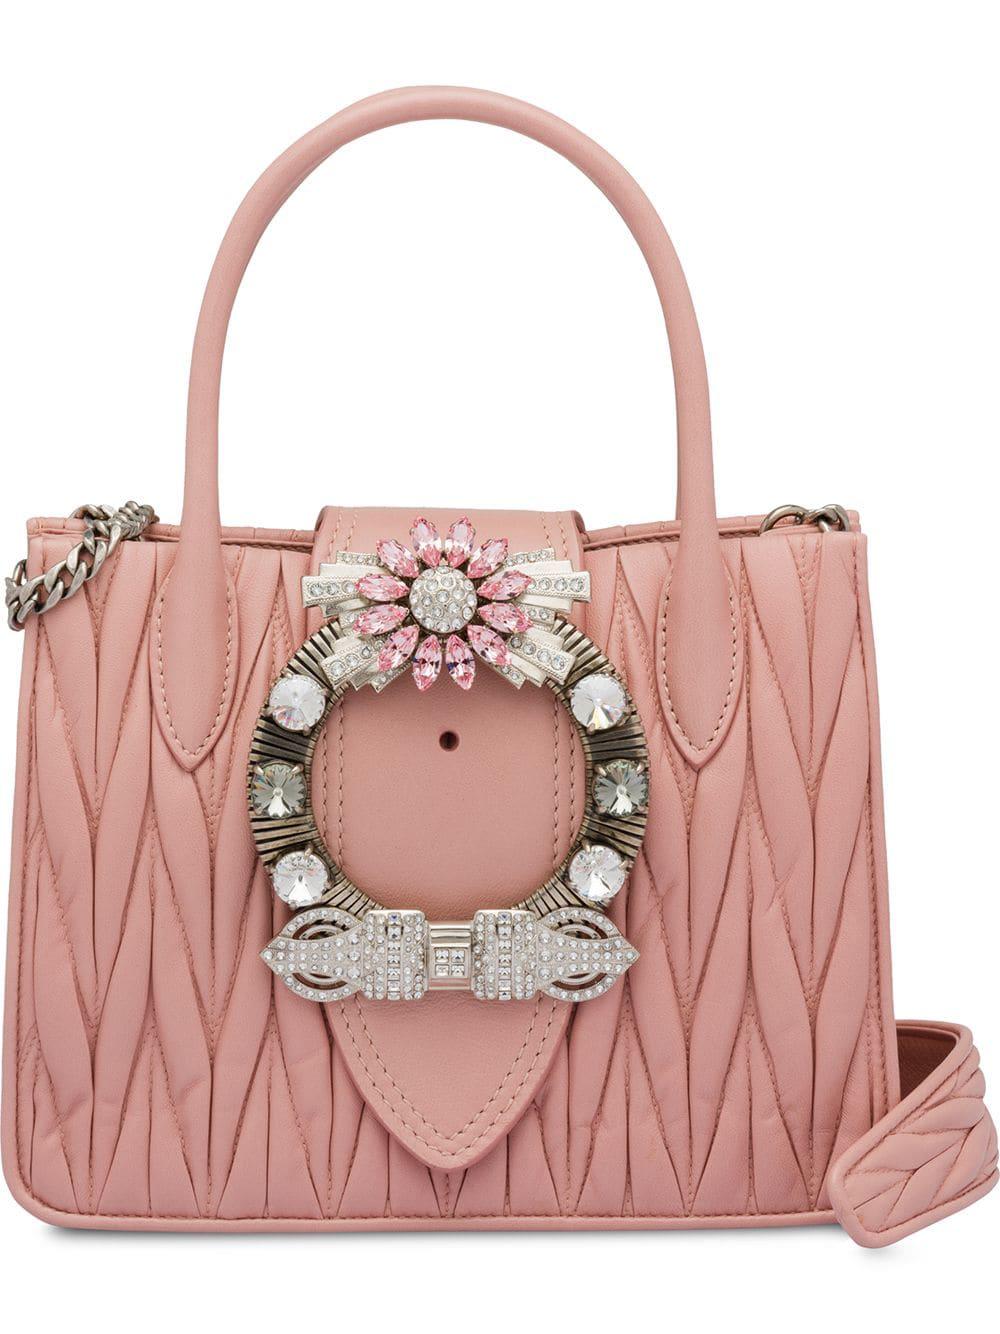 b22fed1c21f3 Miu Miu Miu Lady Matelassé Handbag - Pink